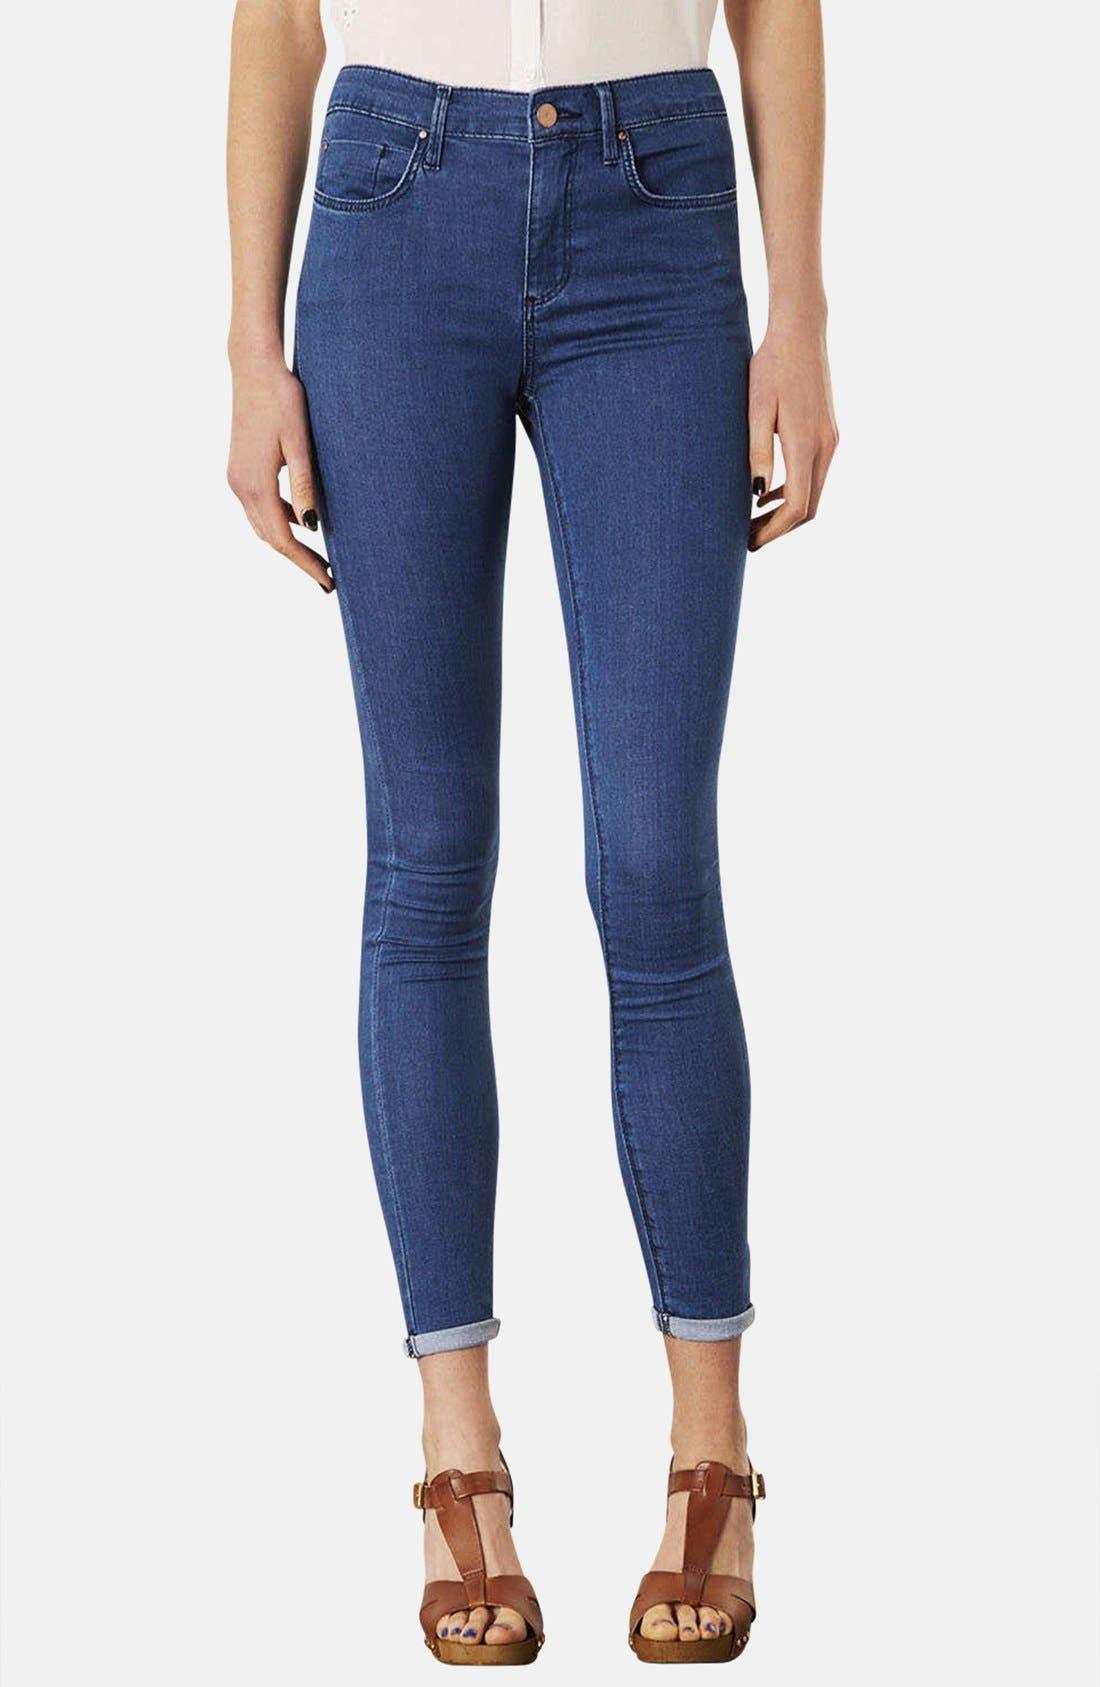 Alternate Image 1 Selected - Topshop Moto 'Leigh' Skinny Jeans (Blue) (Regular & Short)